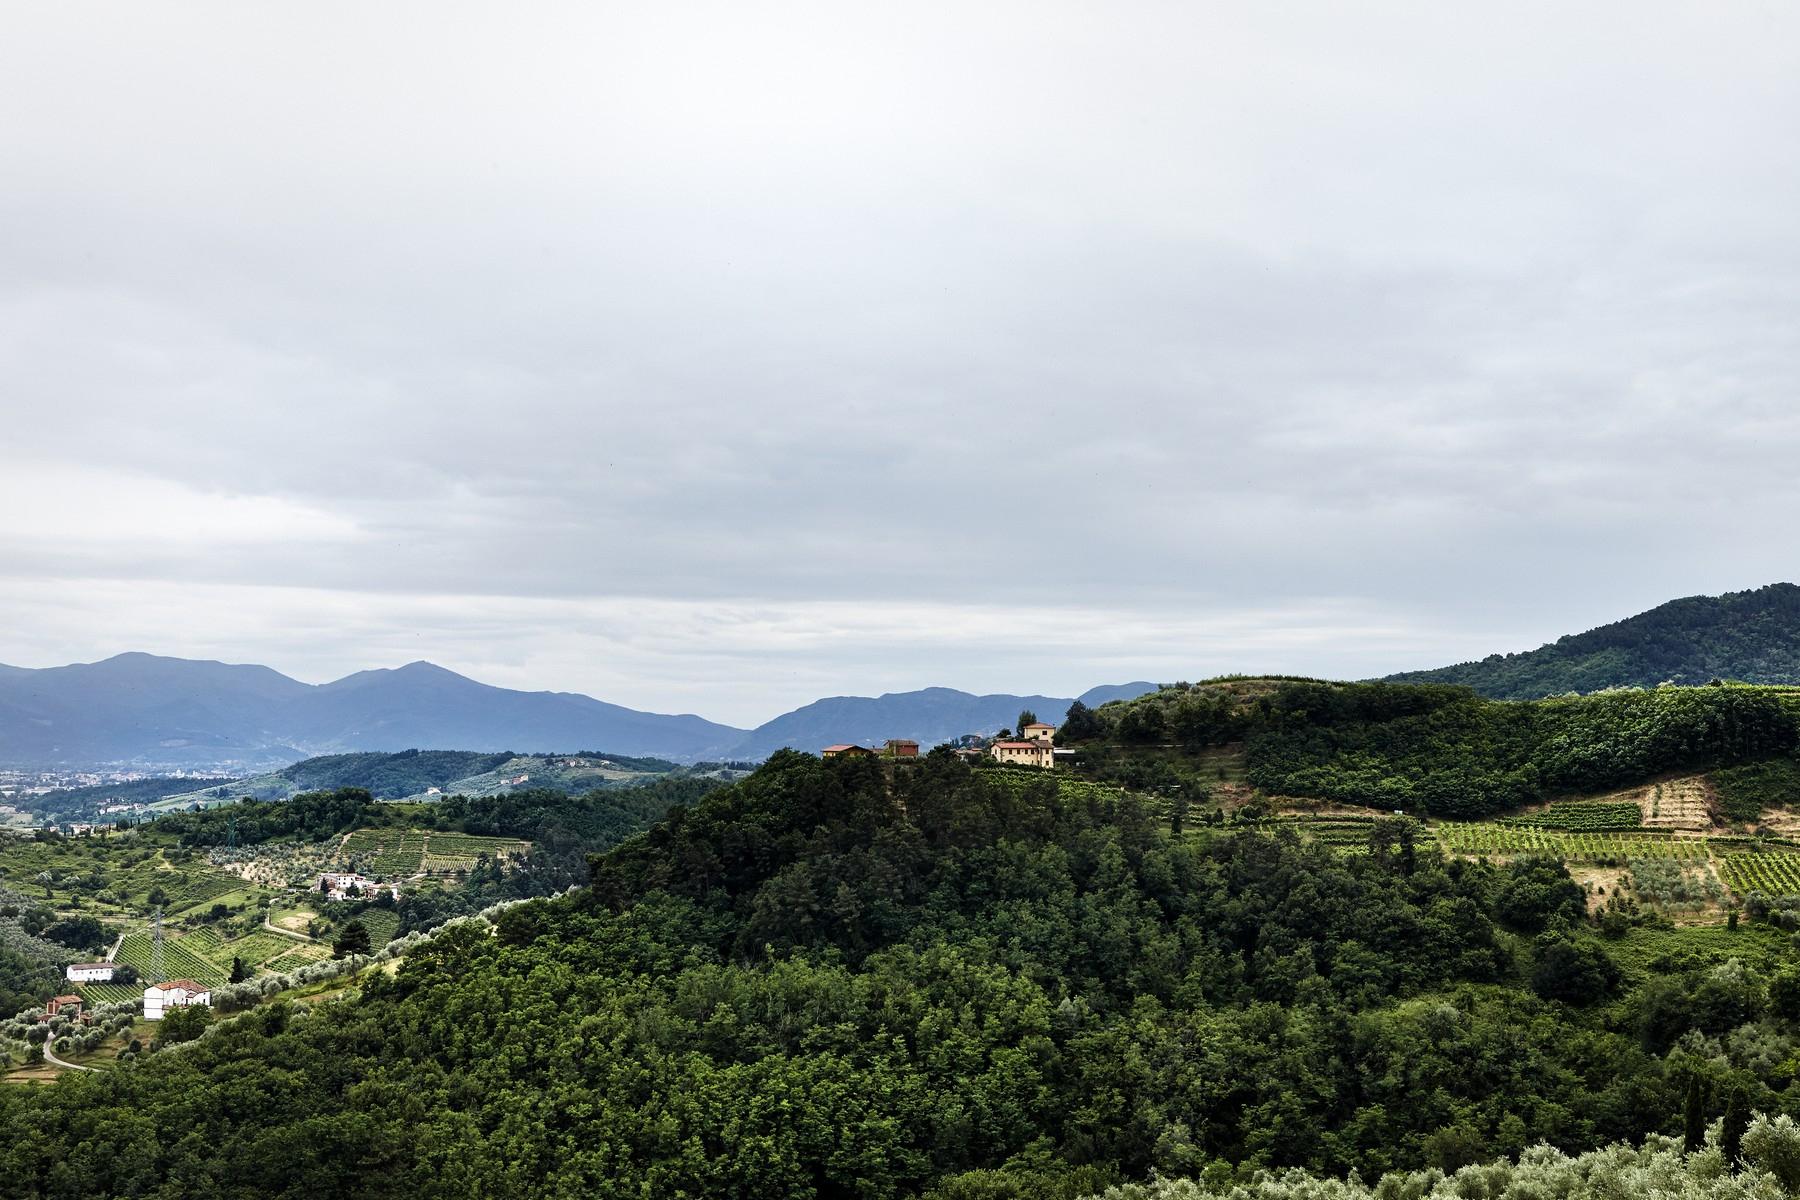 Villa in Vendita a Lucca: 5 locali, 2500 mq - Foto 13